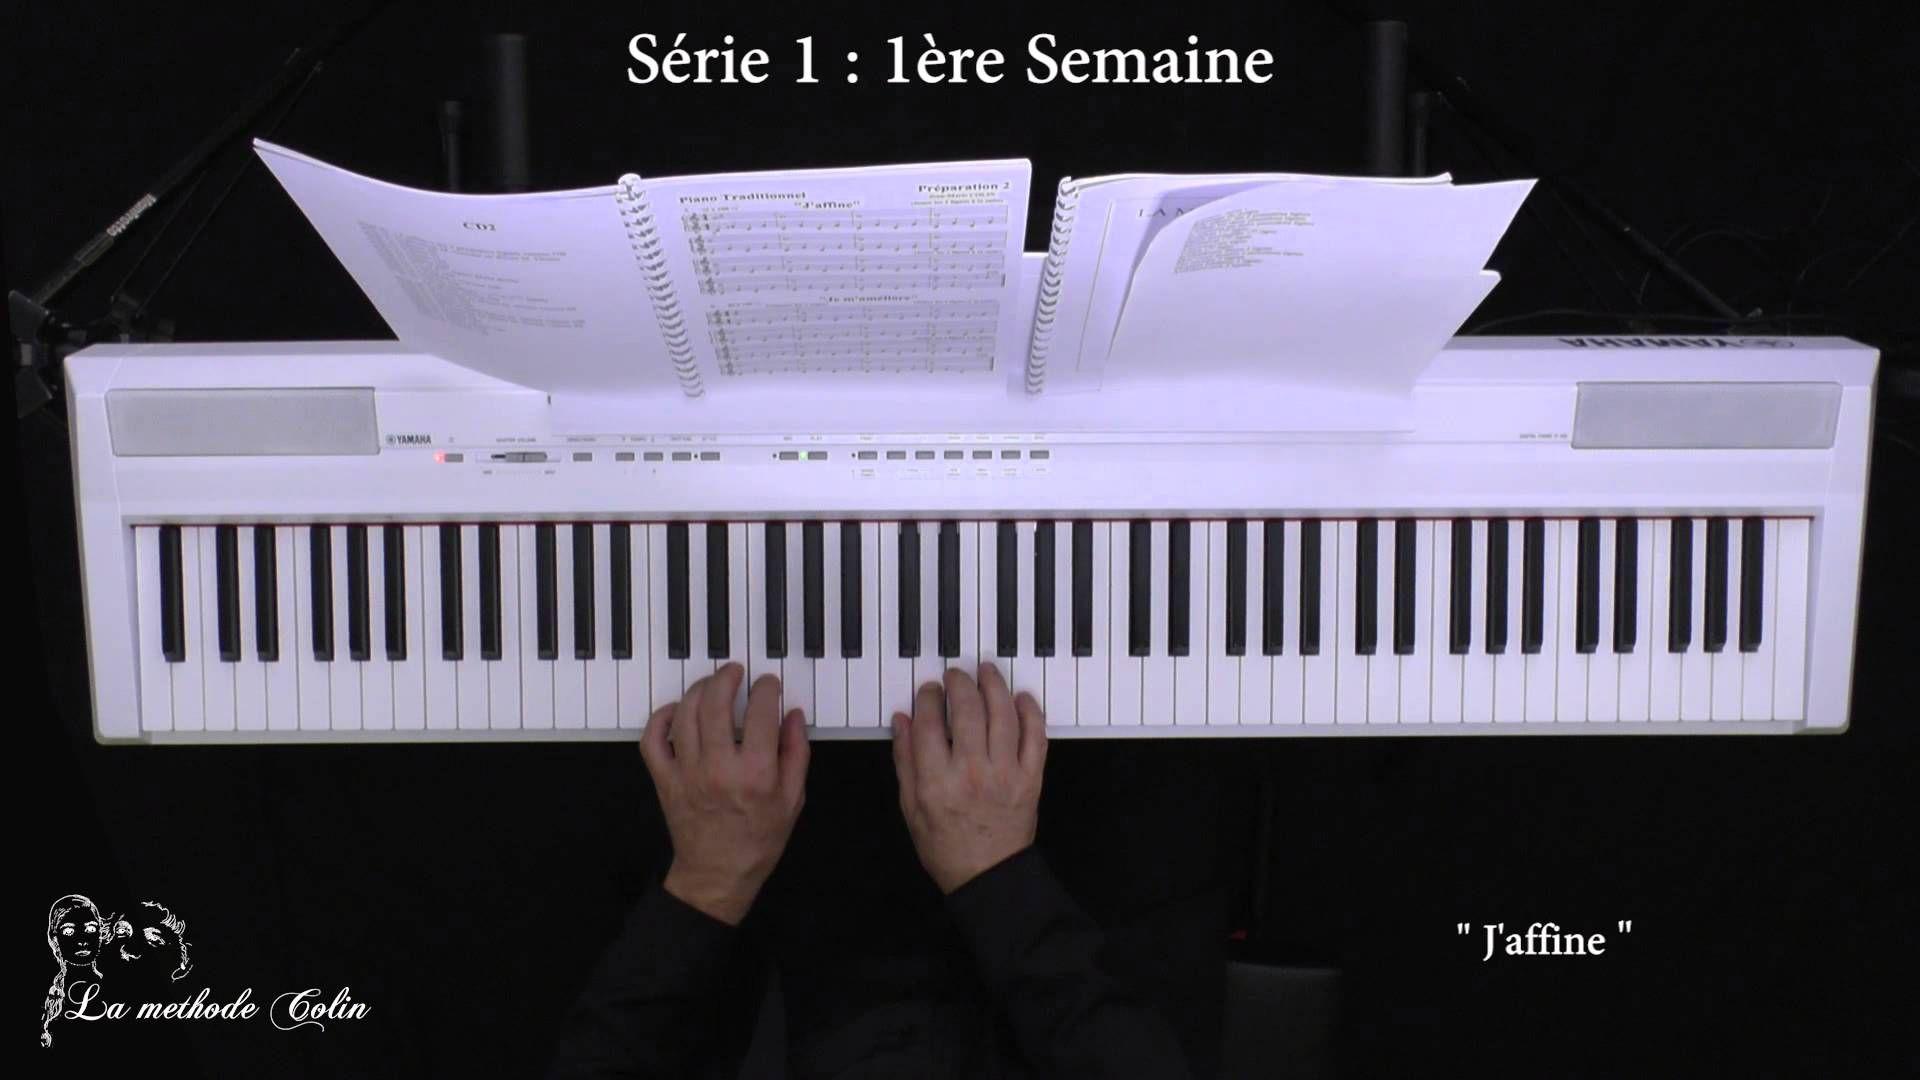 Méthode Colin - Les Séries Piano - Série 1